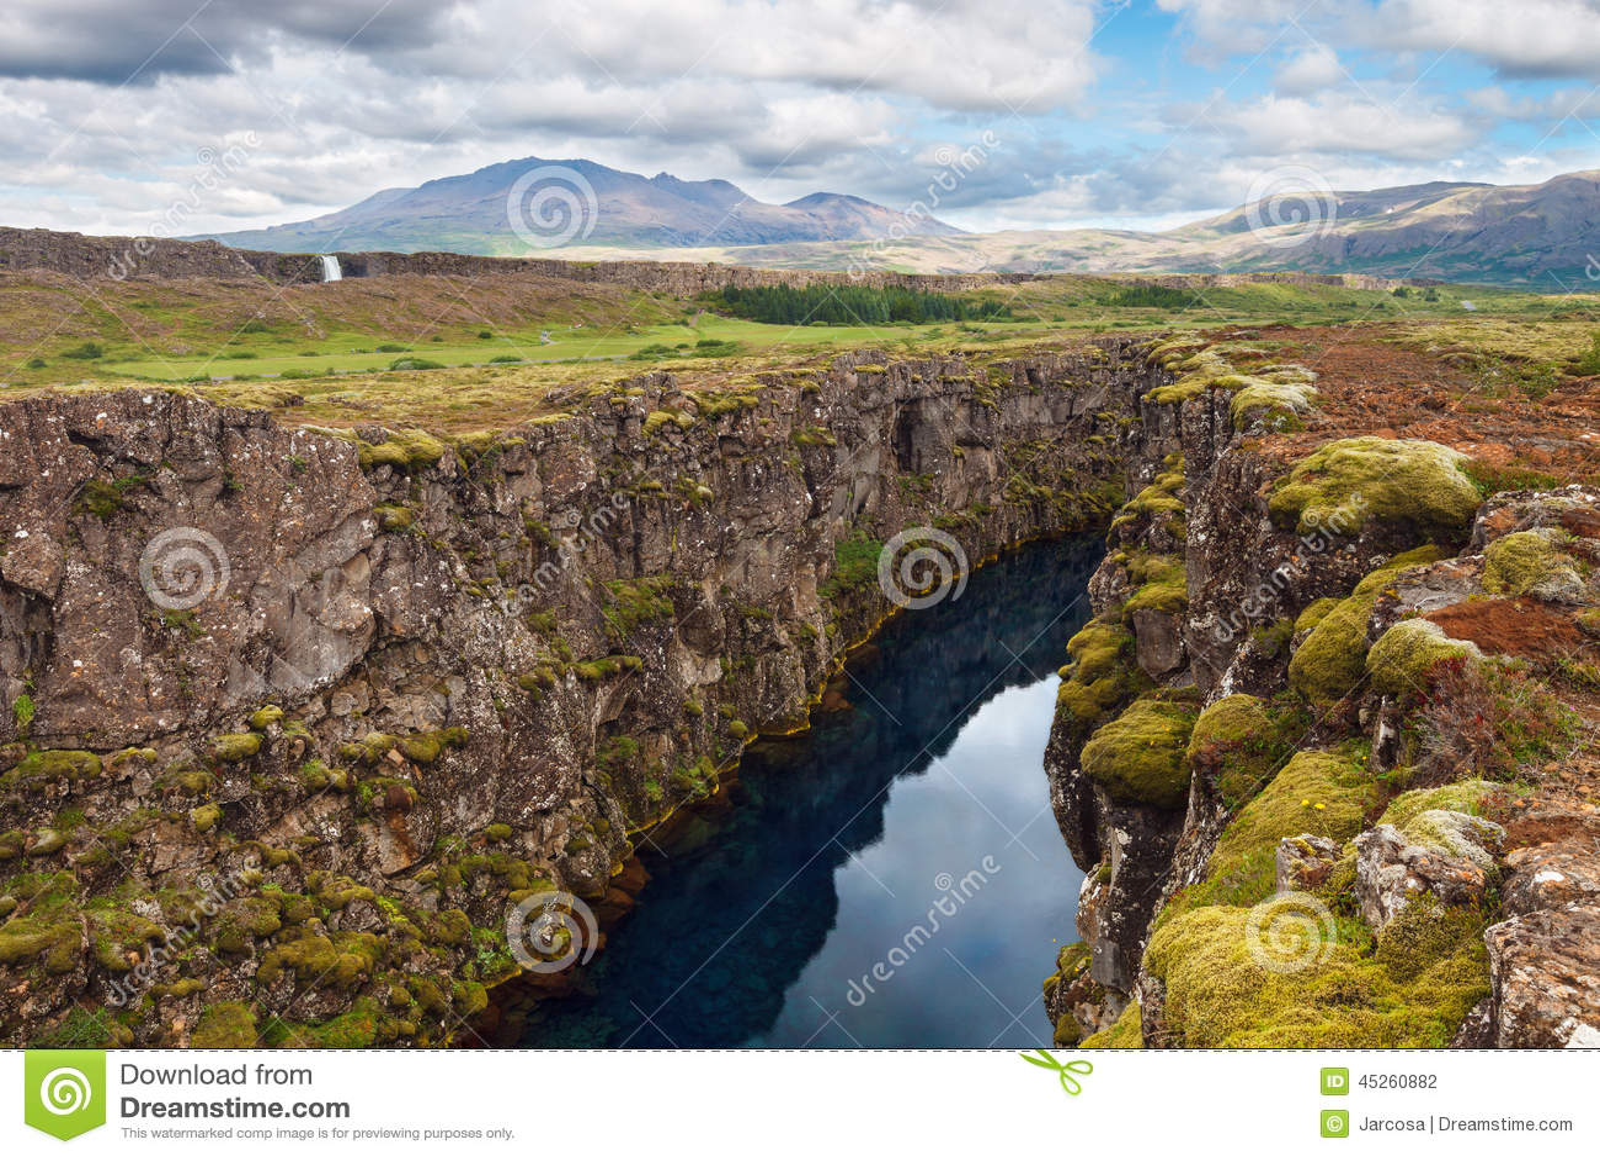 on thingvellir national park map